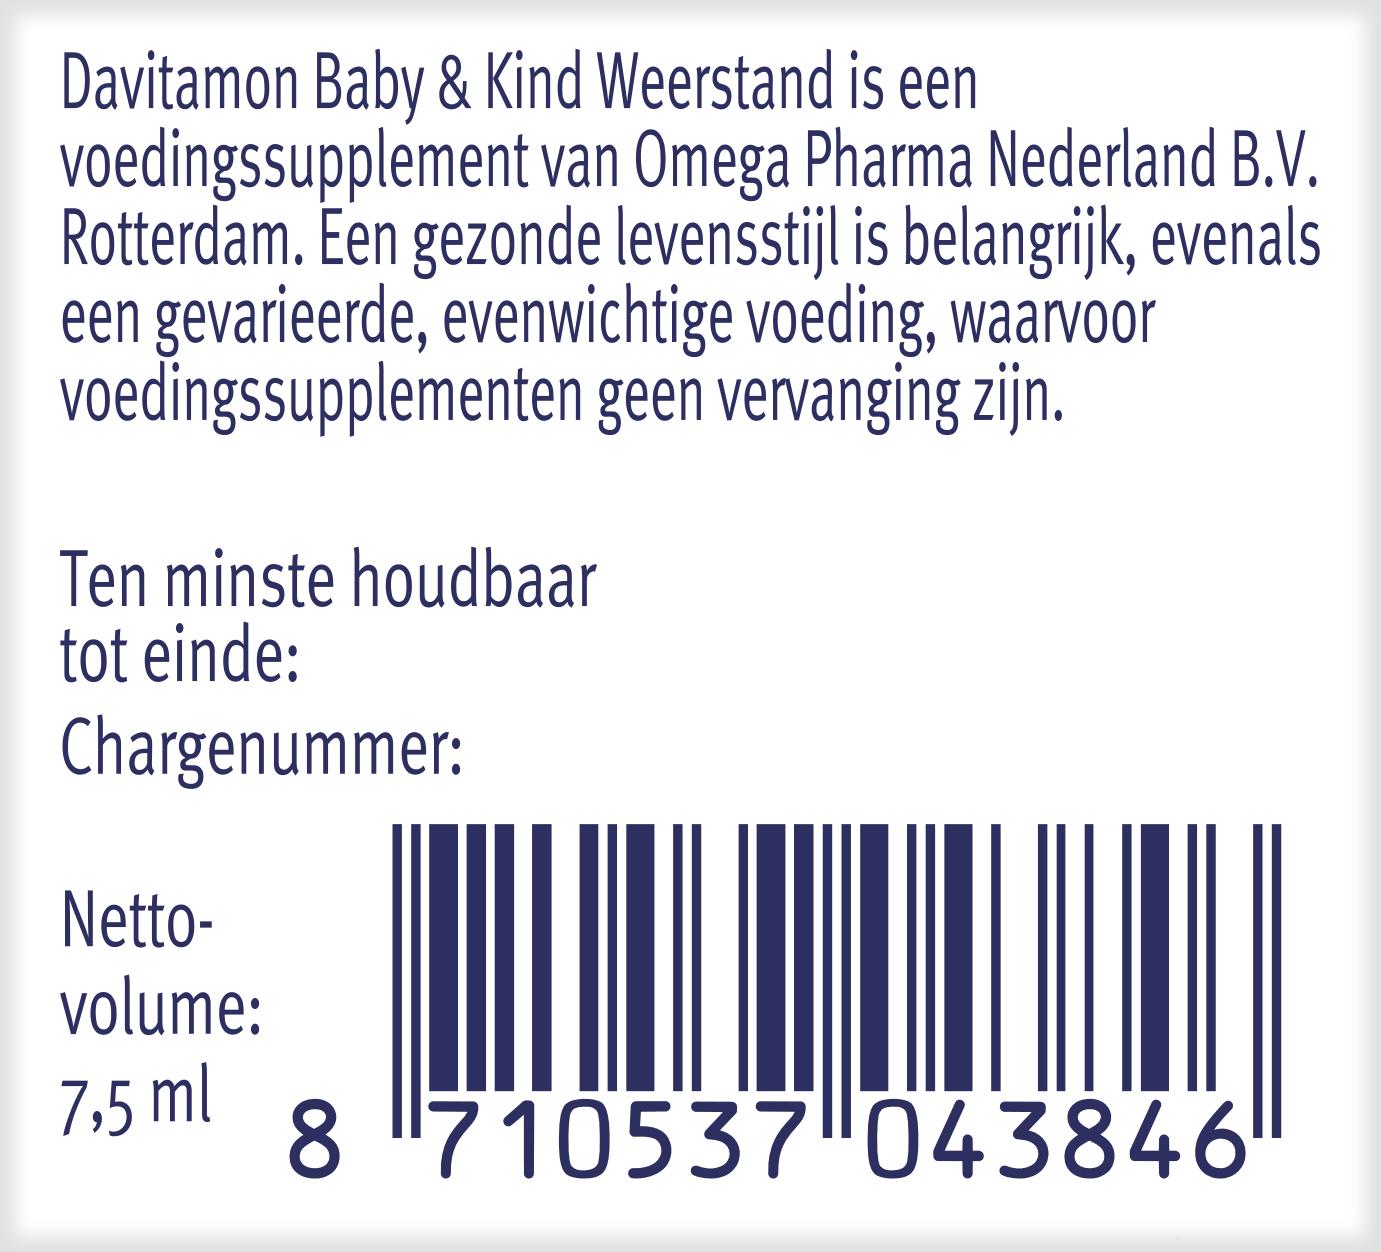 Davitamon Baby & Kind Weerstand barcode